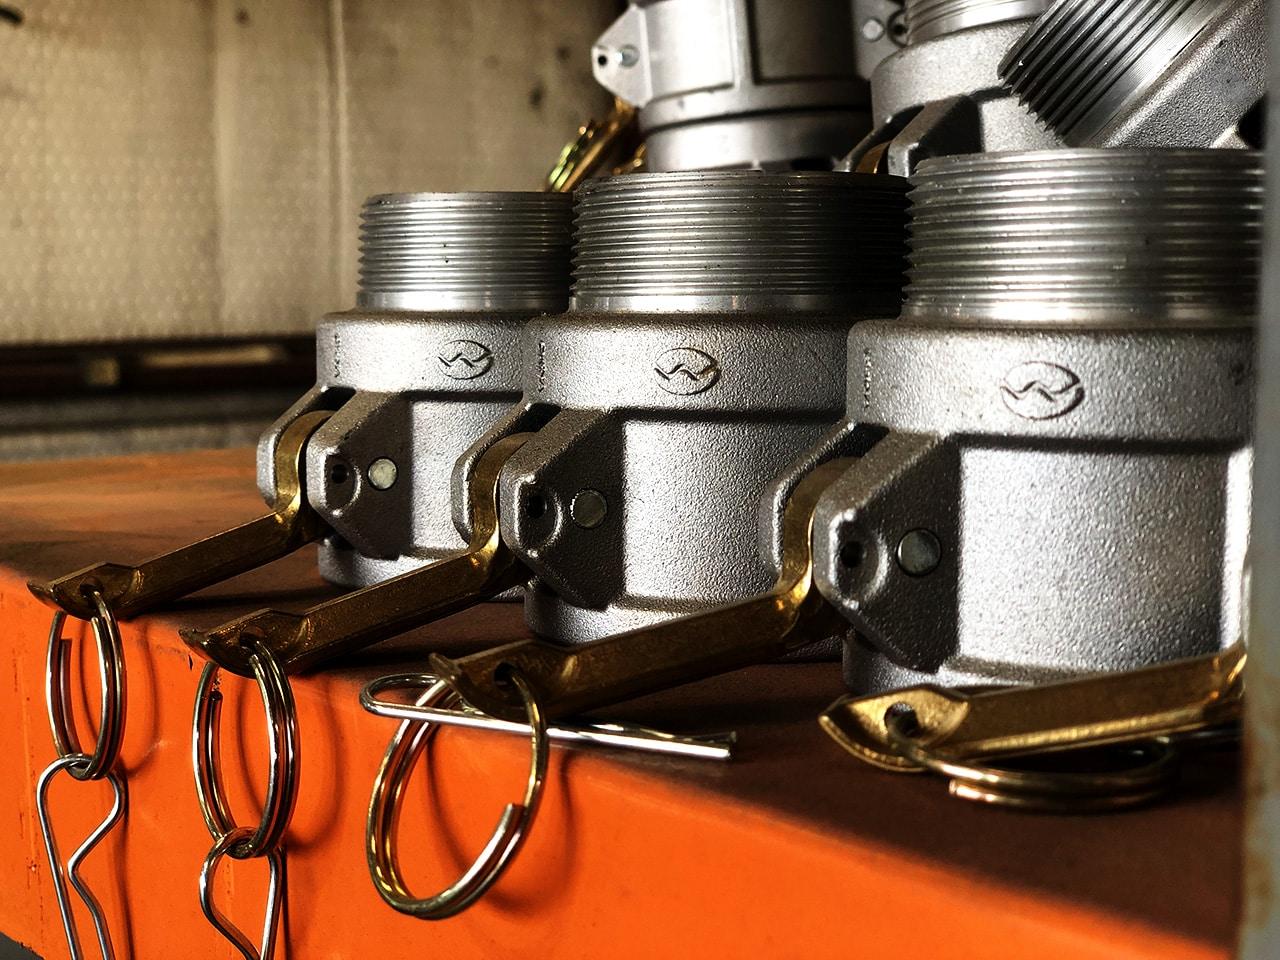 San Antonio Mobile Hydraulic Repair